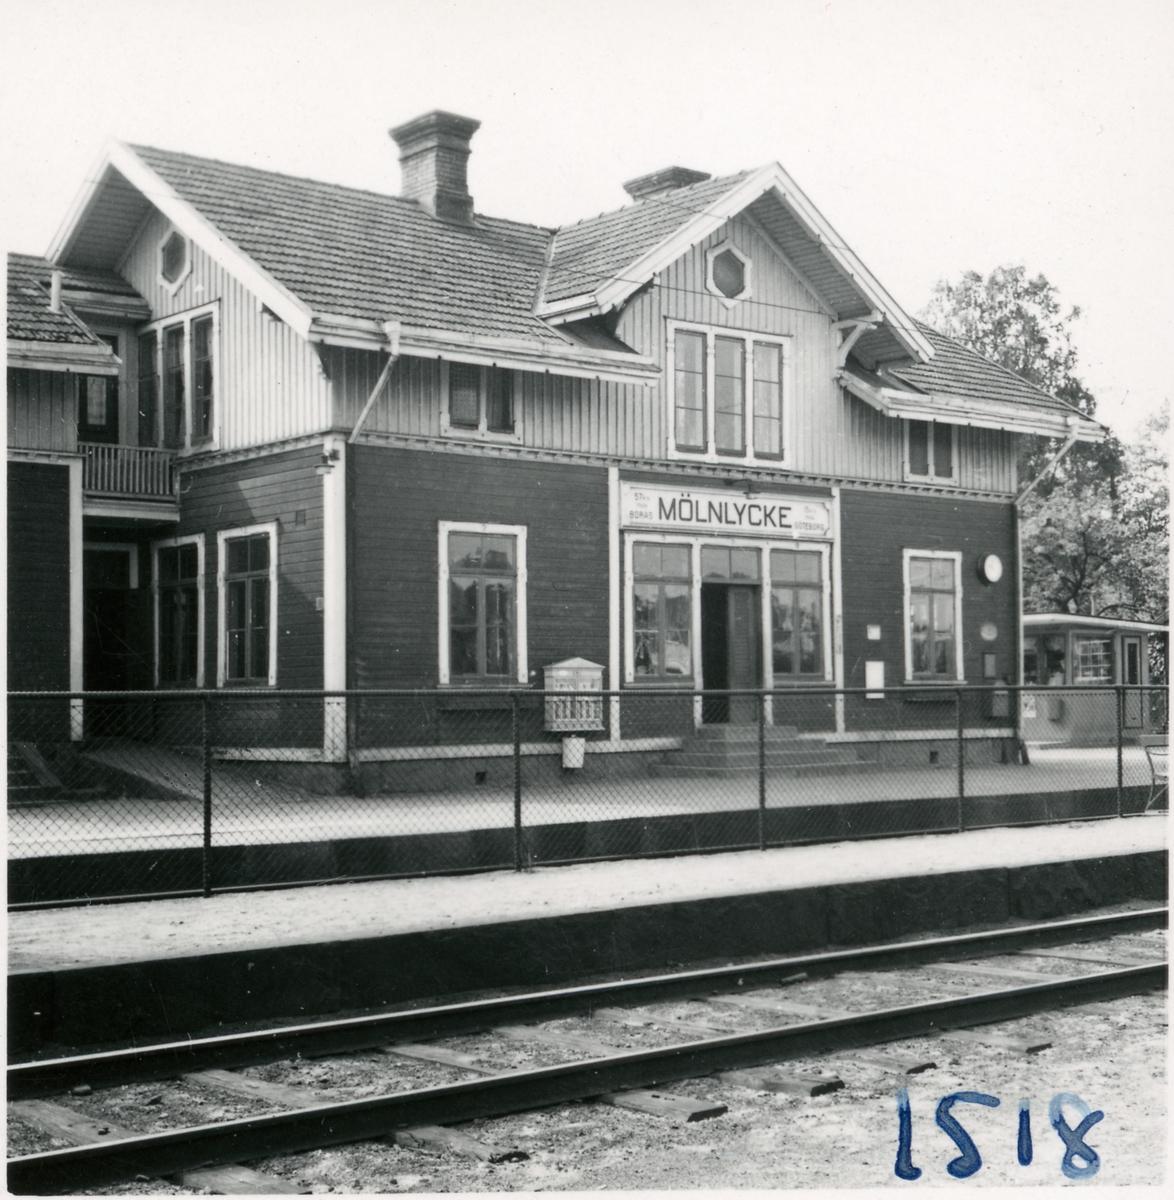 Mölnlycke stationshus.